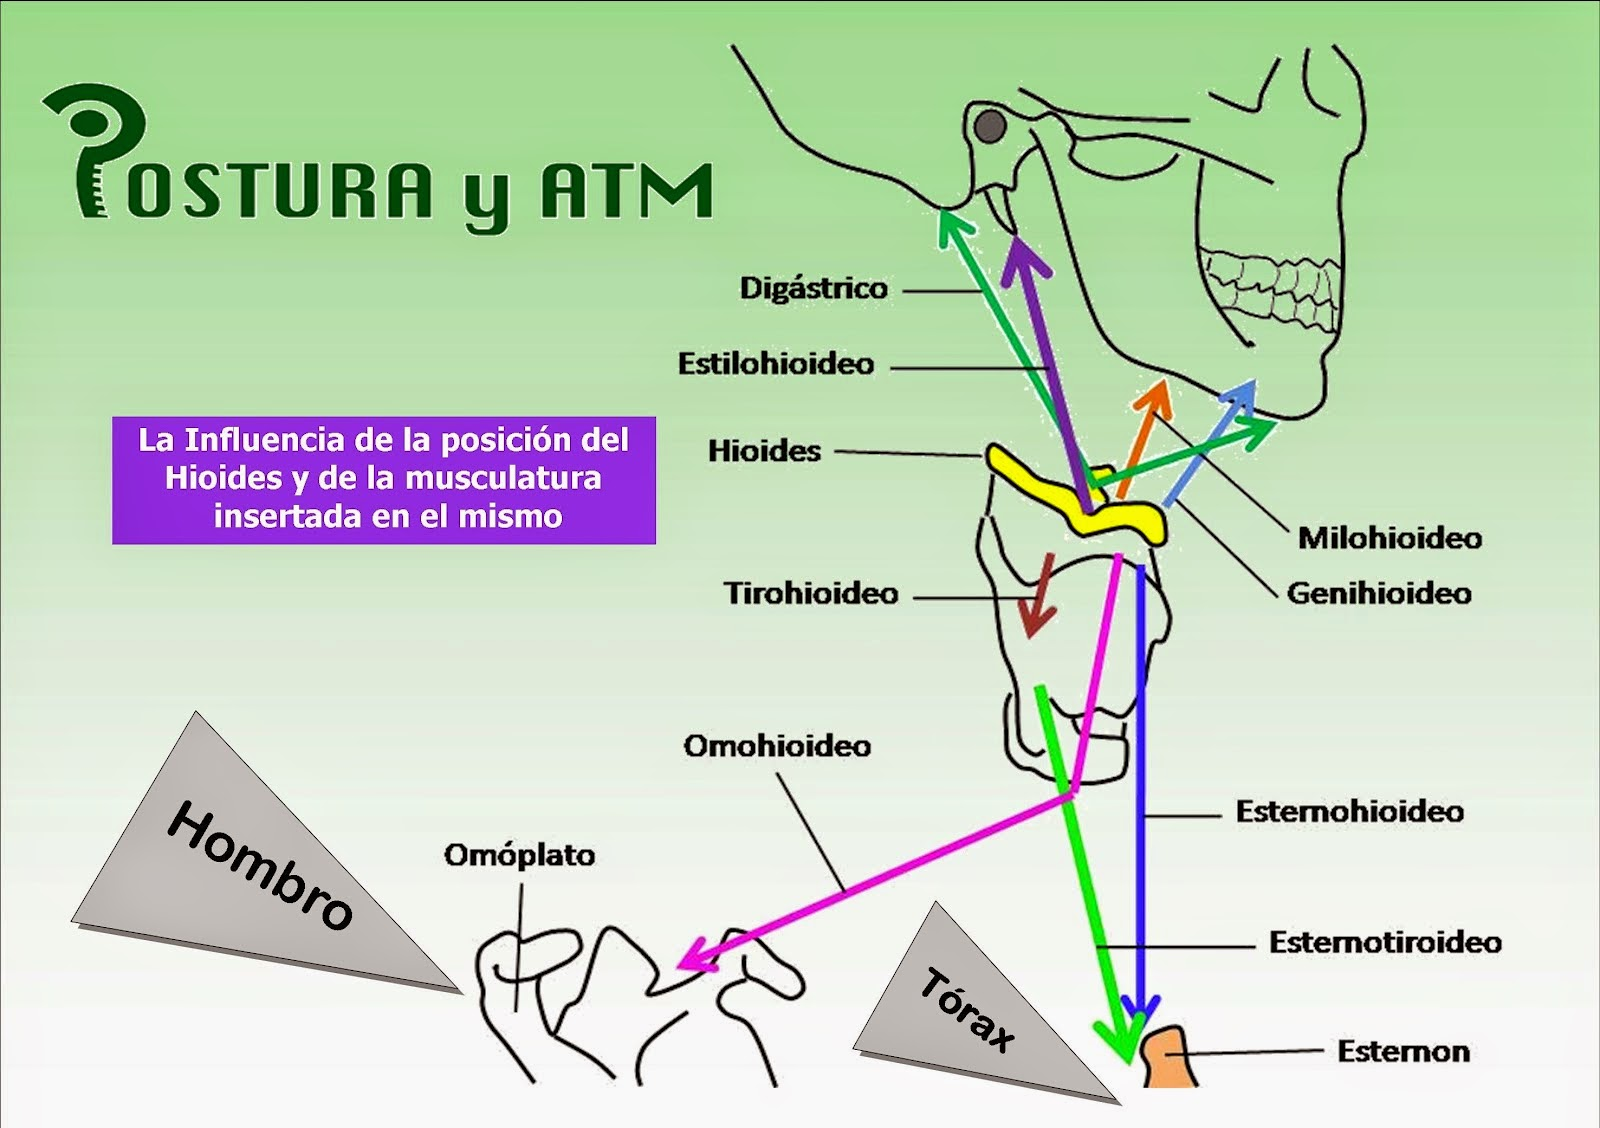 Rehabilitacion Musculo Esqueletica: Hioides !!